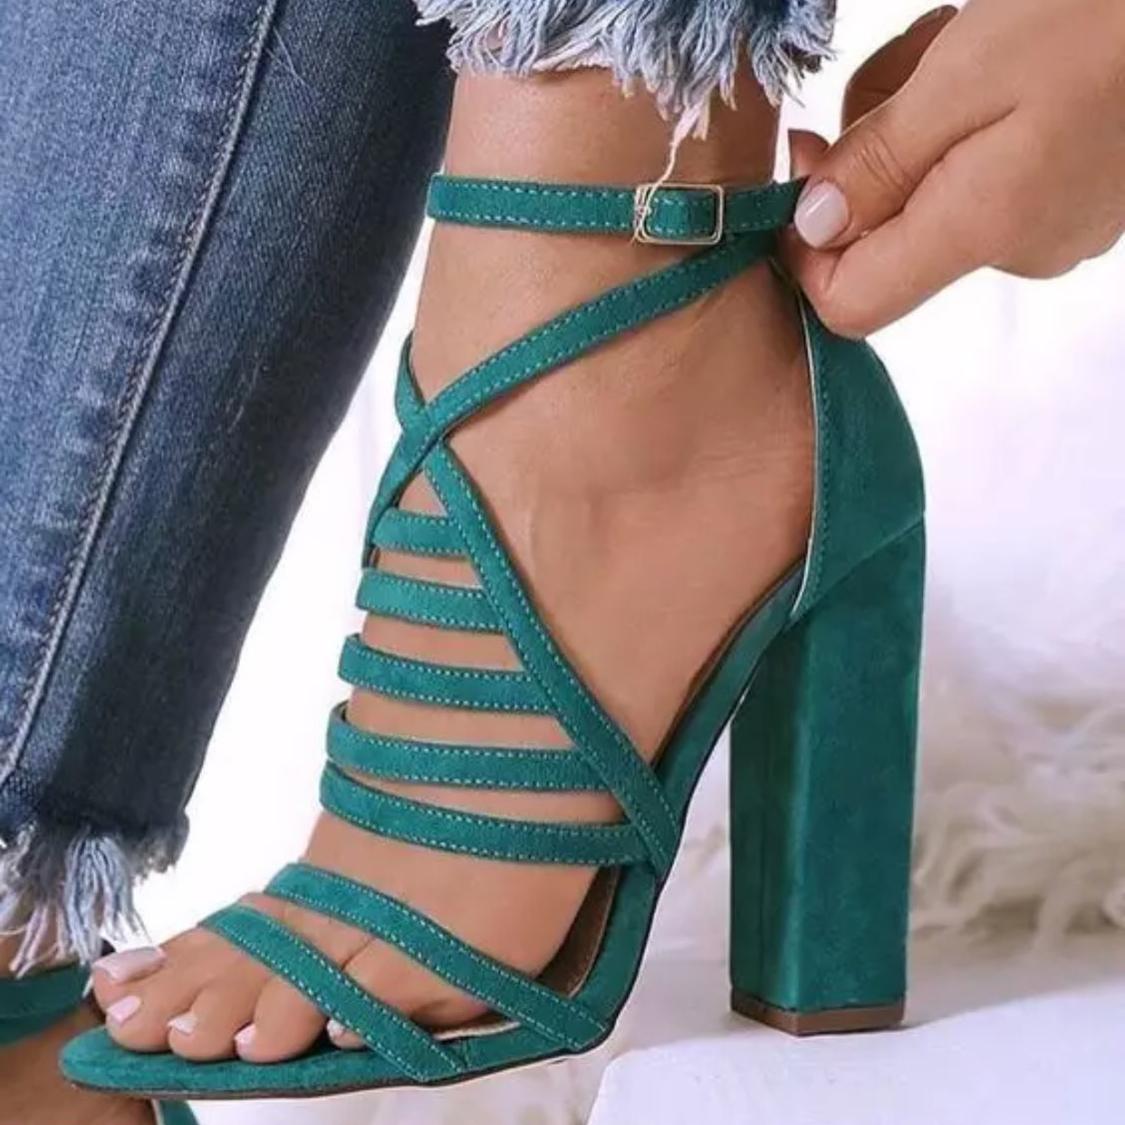 women's shoes summer chunky heels peep